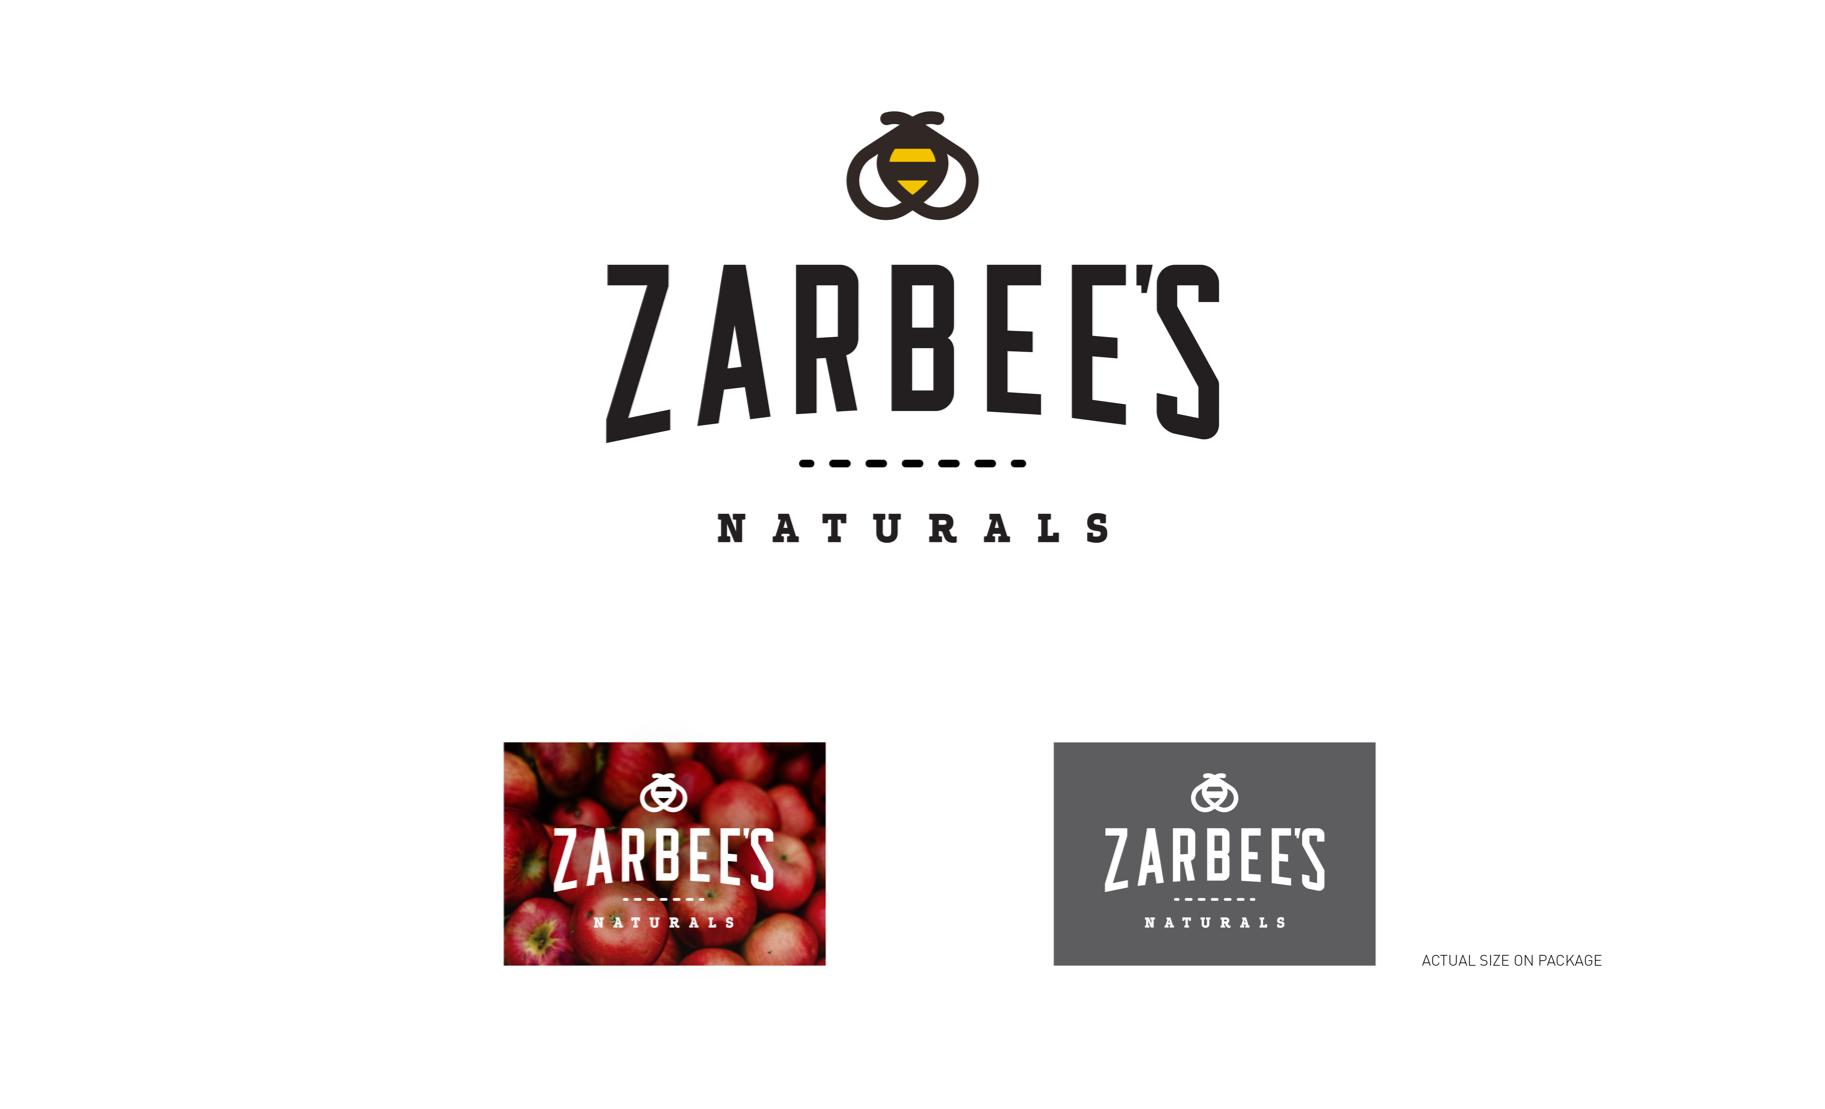 Zarbee's final logo design option